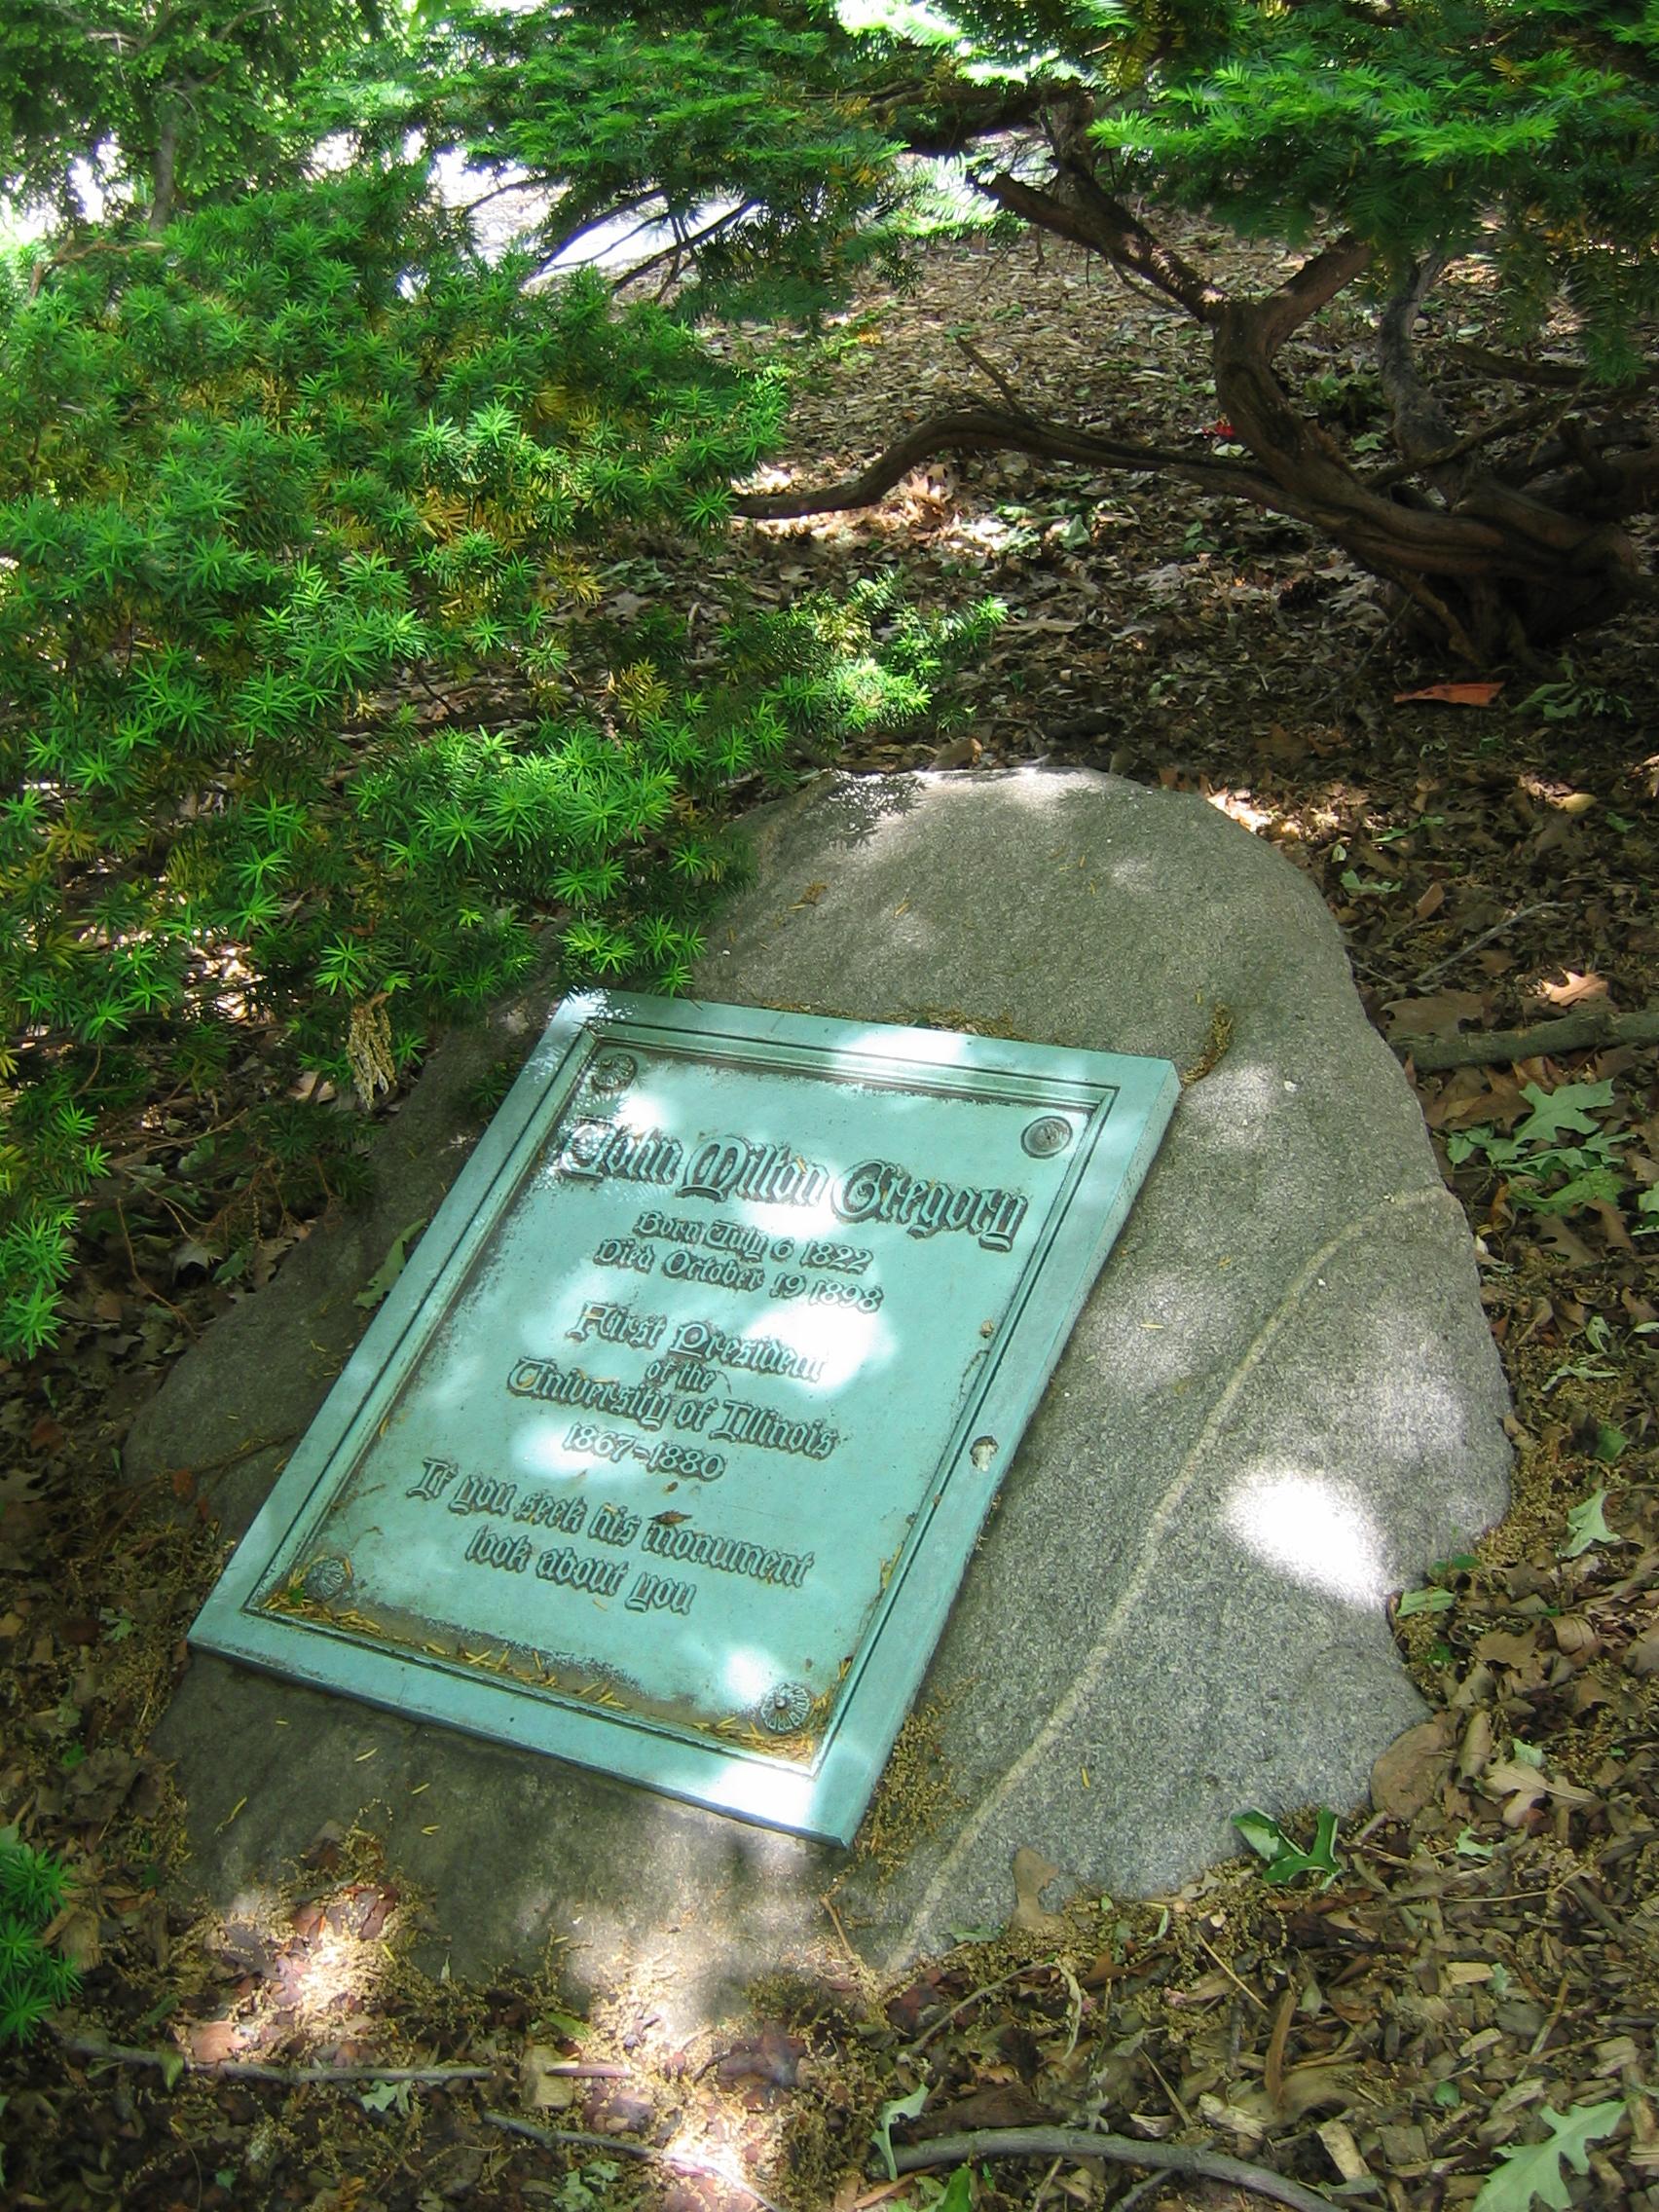 file john milton gregory grave jpg  file john milton gregory grave jpg